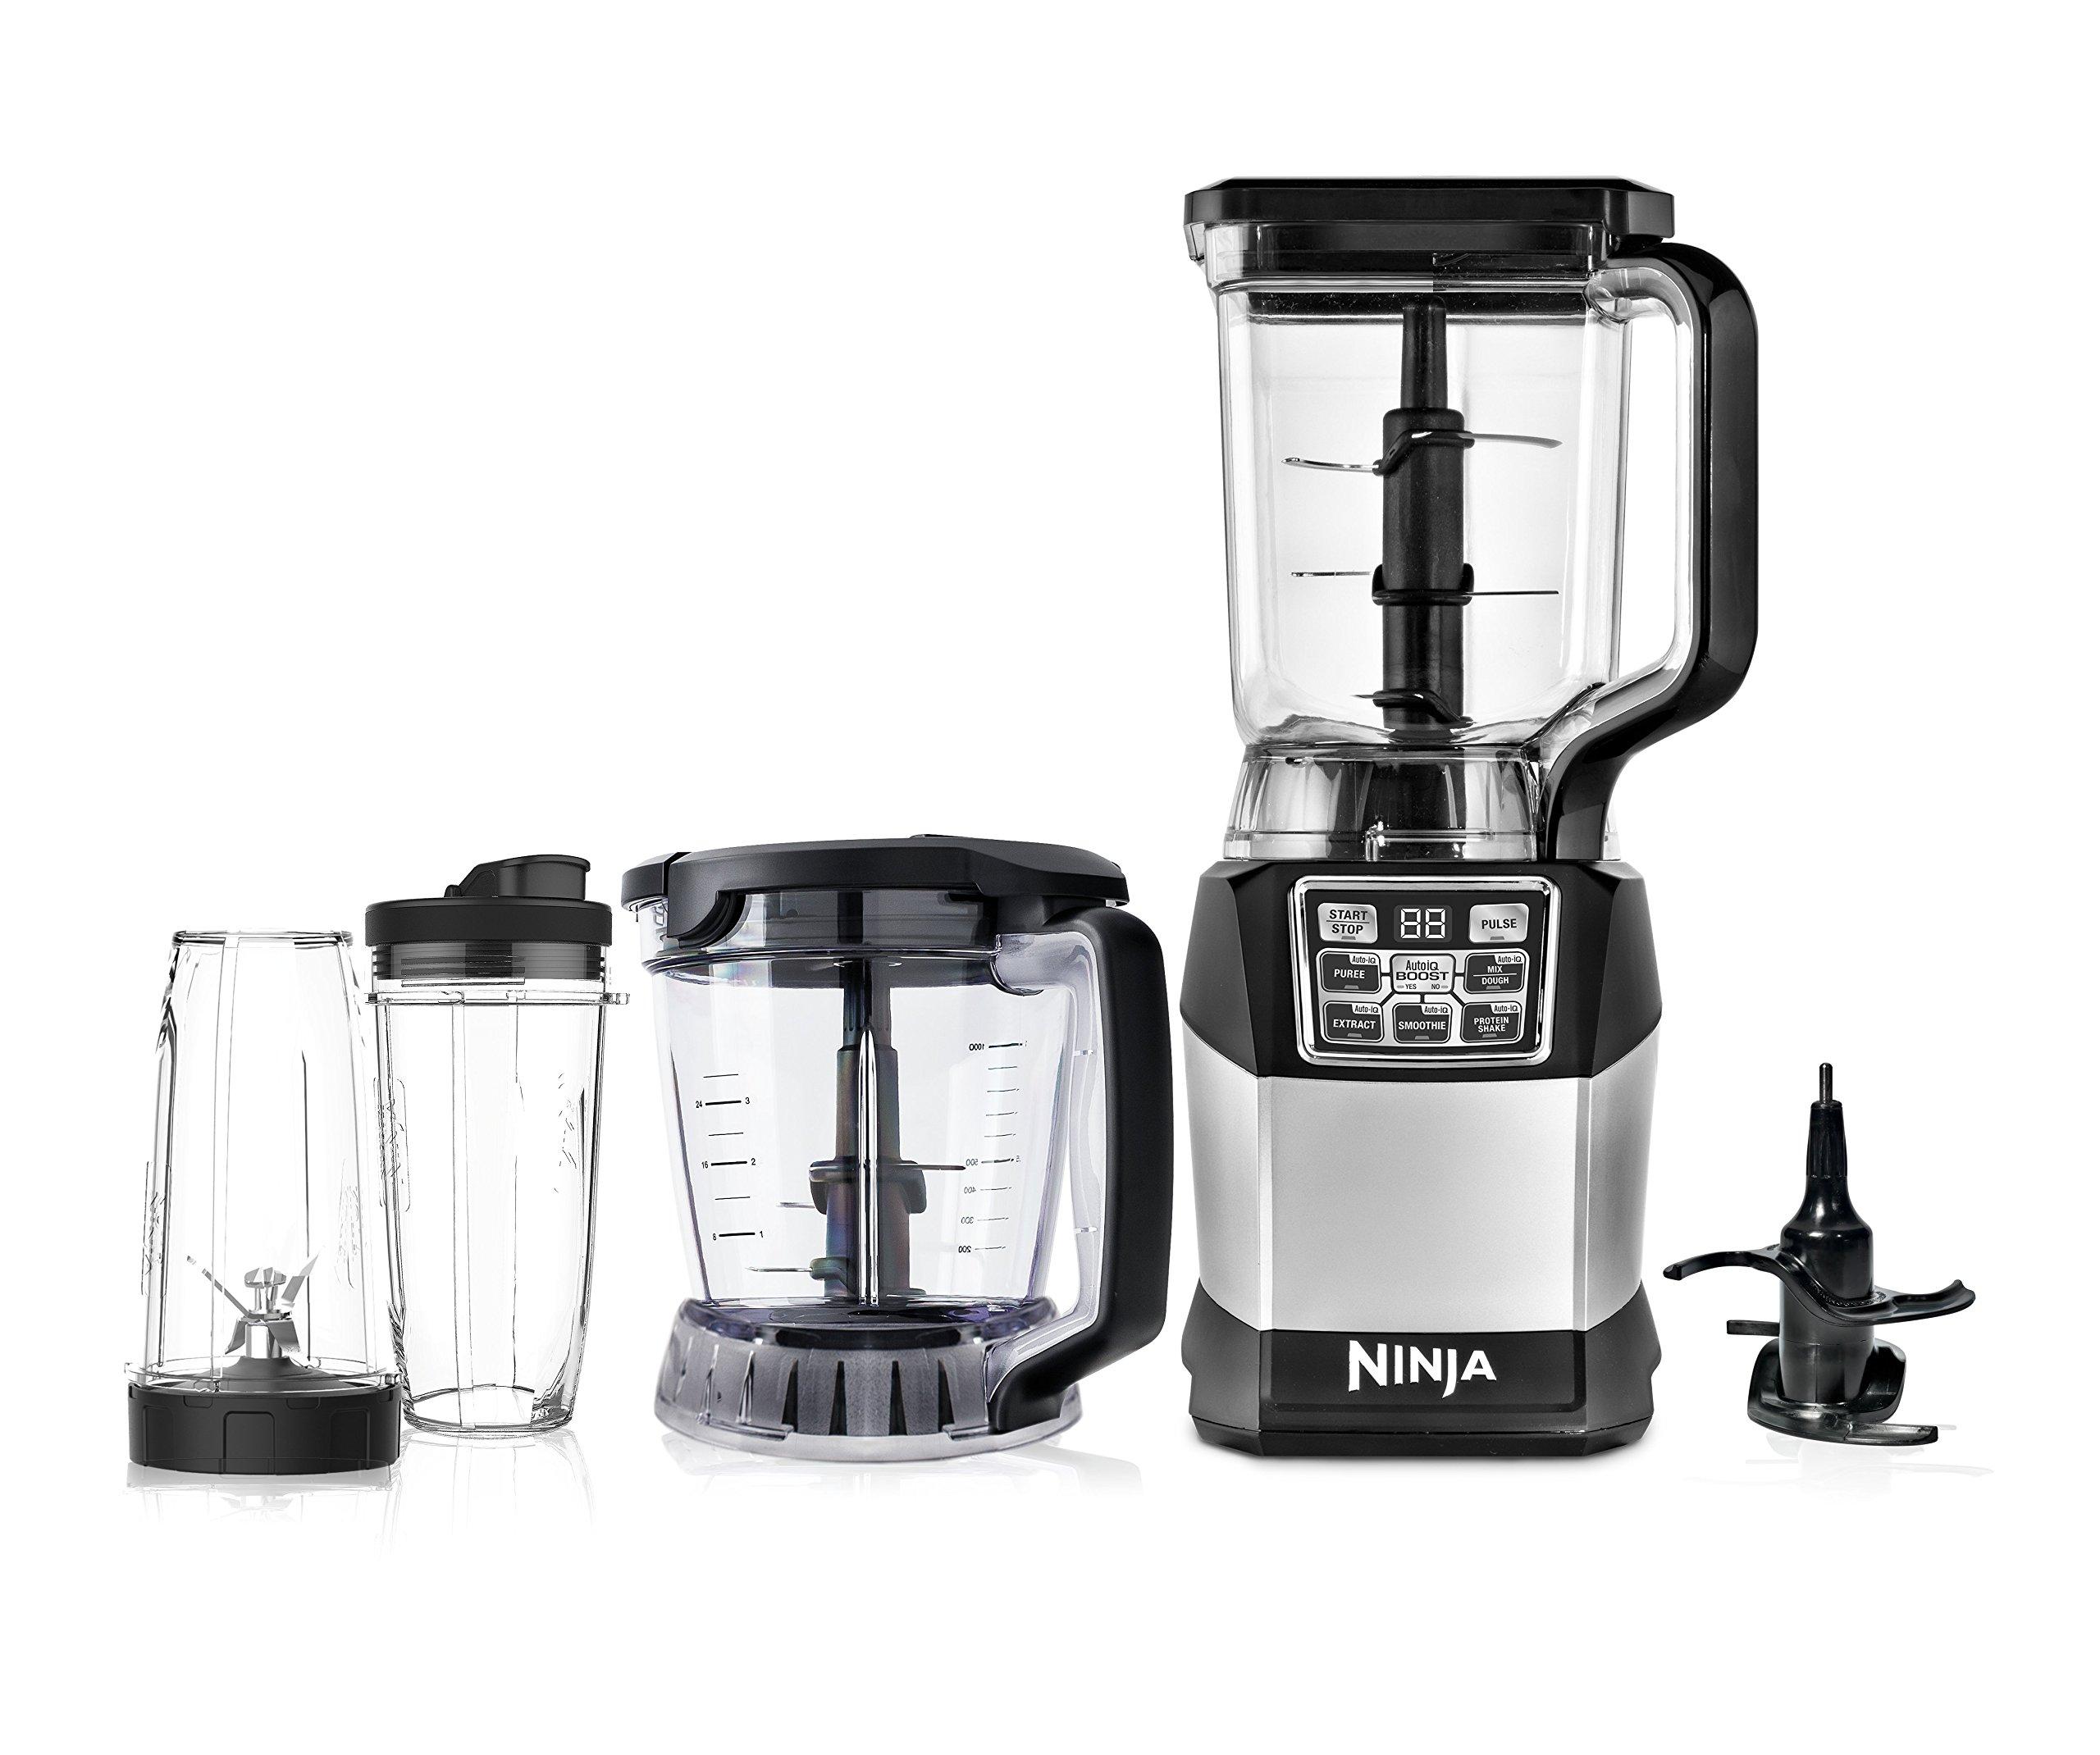 Ninja Kitchen System with Auto-iQ Boost (BL494) by SharkNinja (Image #2)